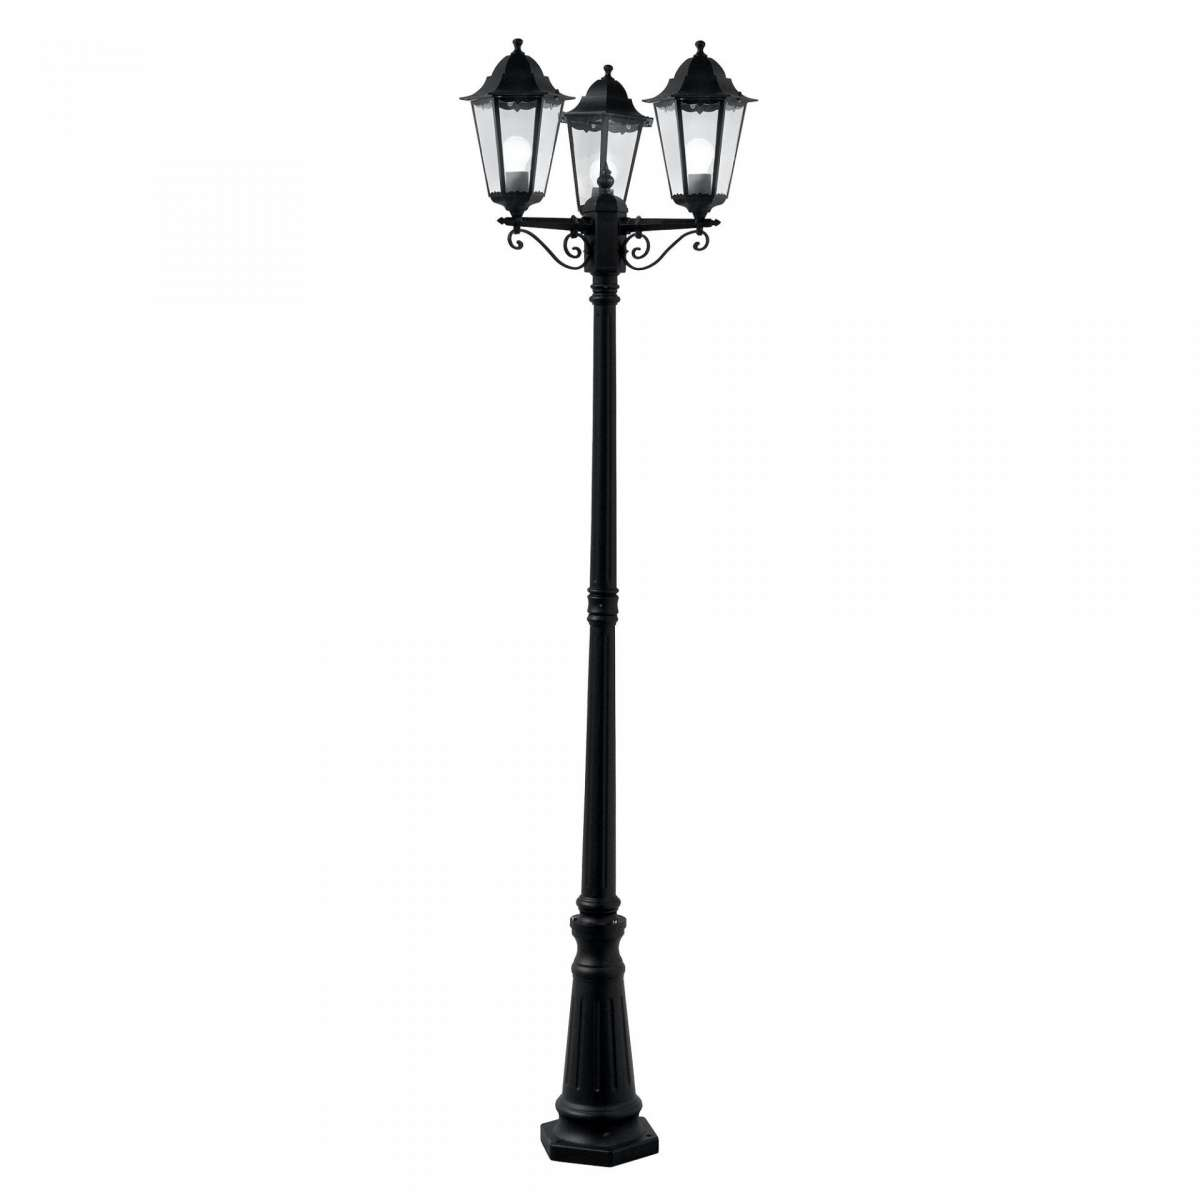 Alex Outdoor 2270mm 3 Light Post Lamp Black